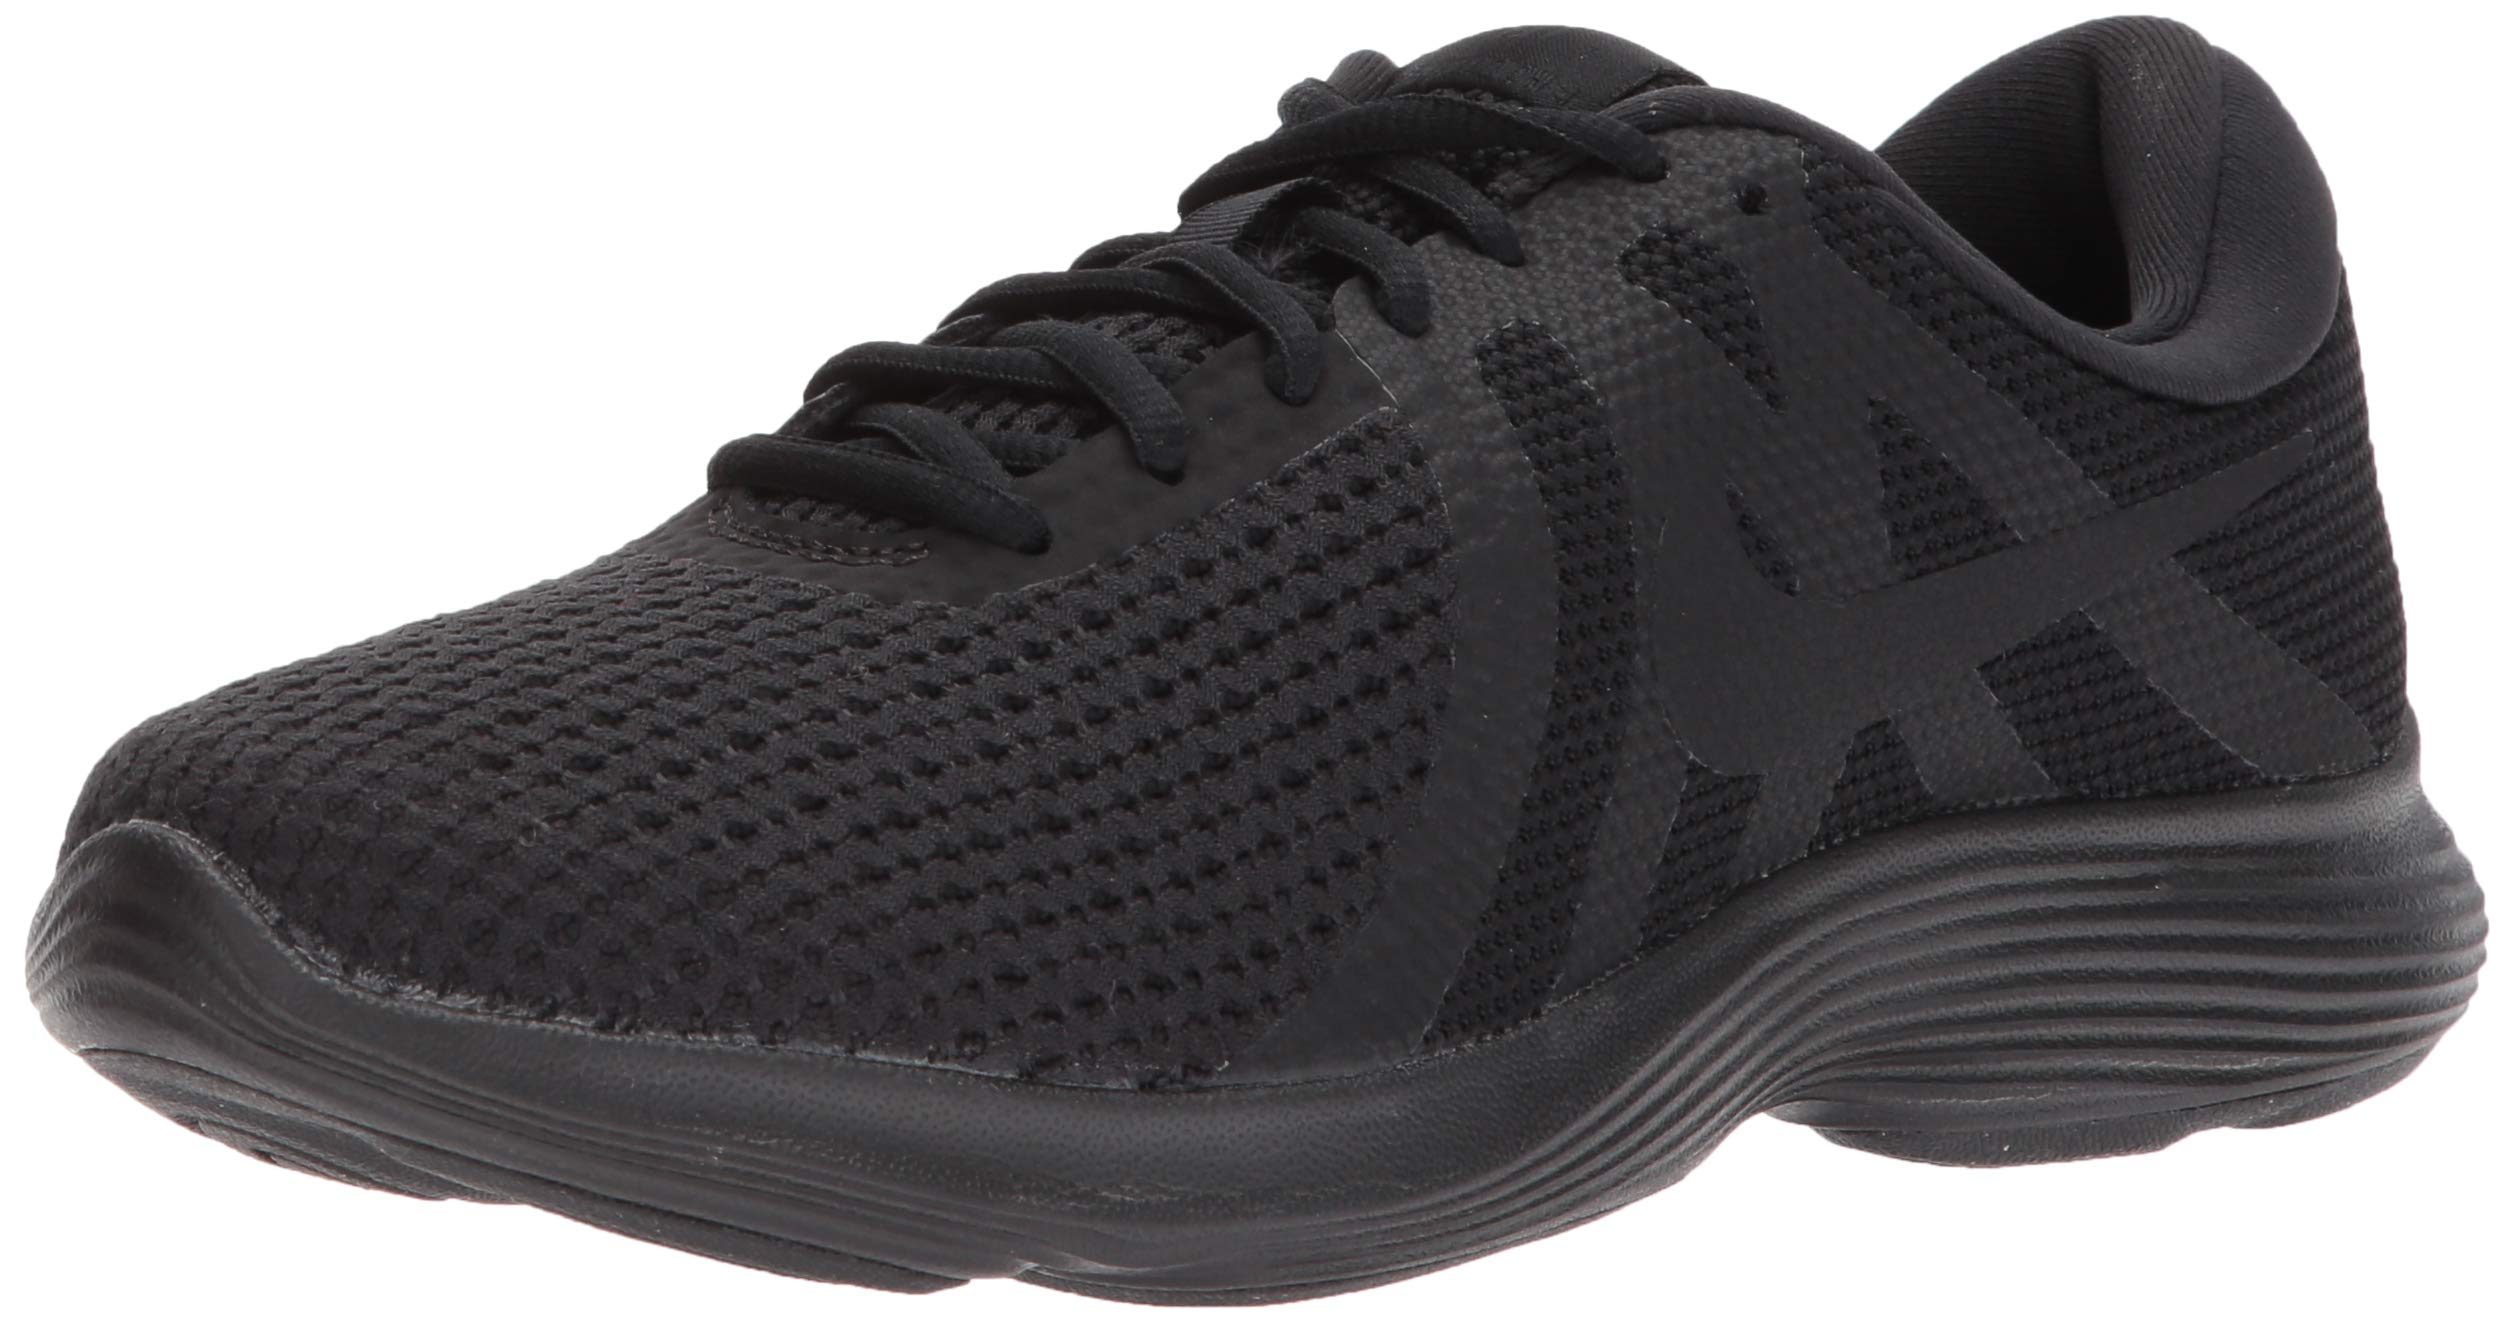 Nike Men's Revolution 4 Running Shoe, Black/White-Anthracite, 7 Regular US by Nike (Image #1)